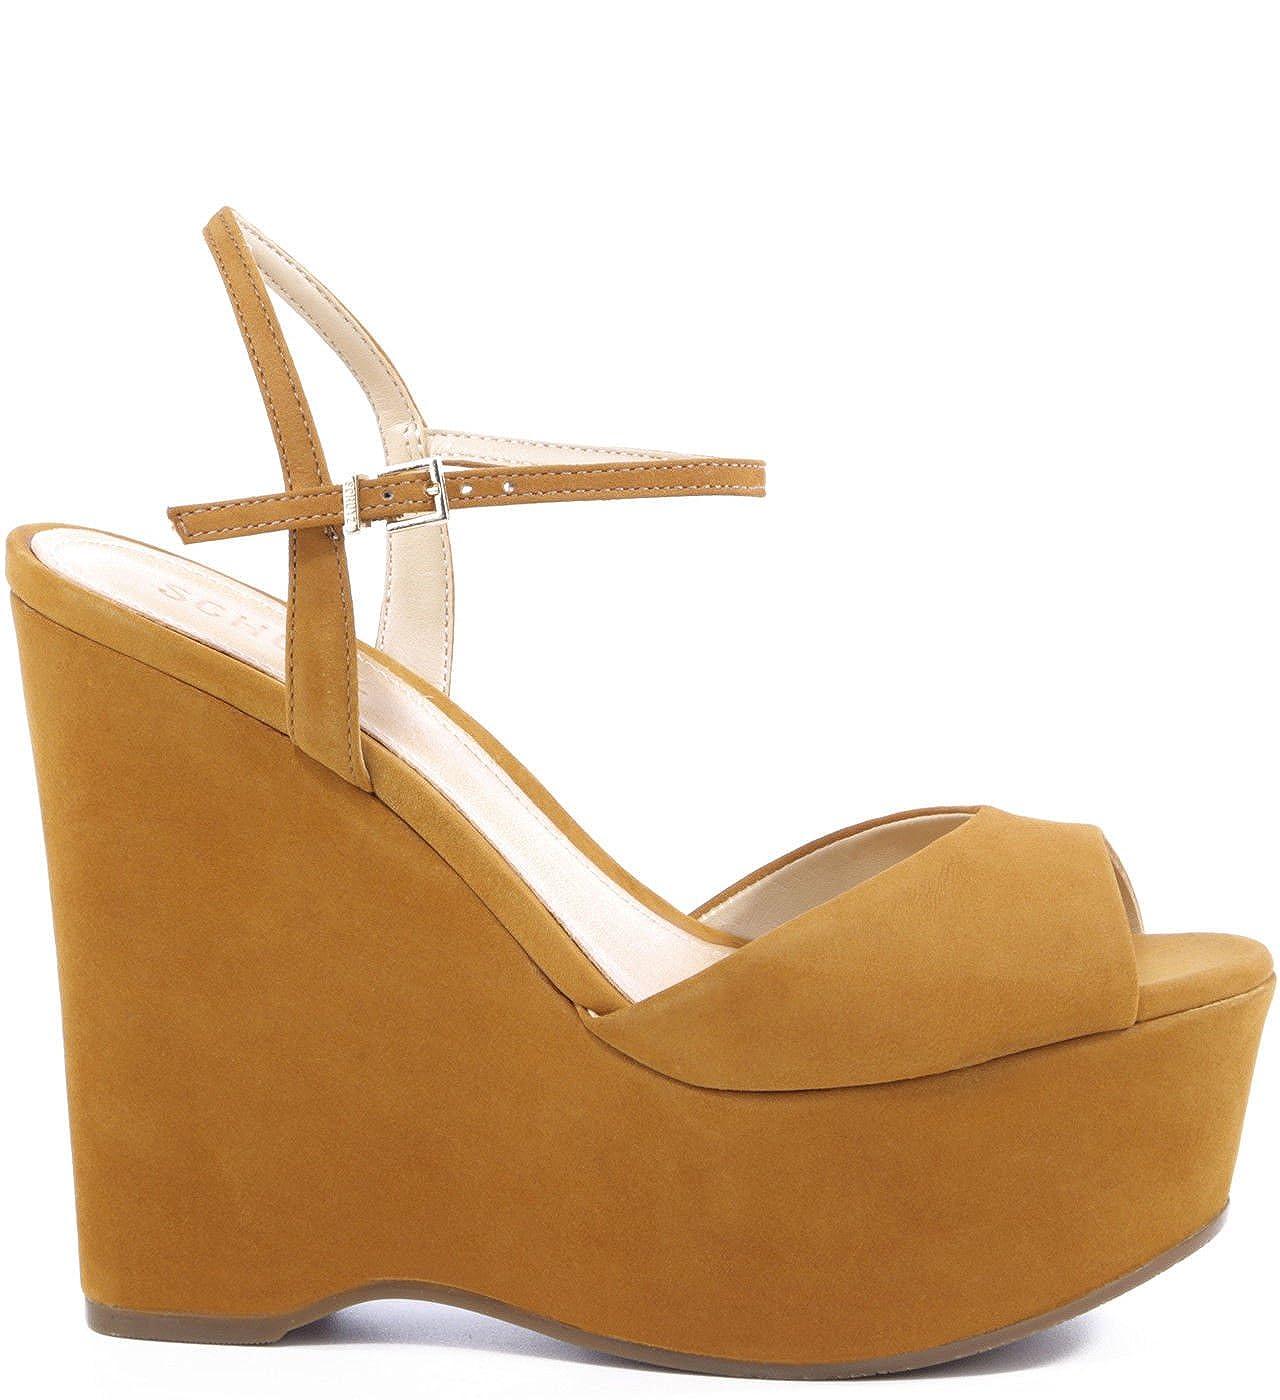 a3c6b69165f3f SCHUTZ Patrycia Saddle Brown High Platform Peep Toe Ankle Strap Wedge  Sandals